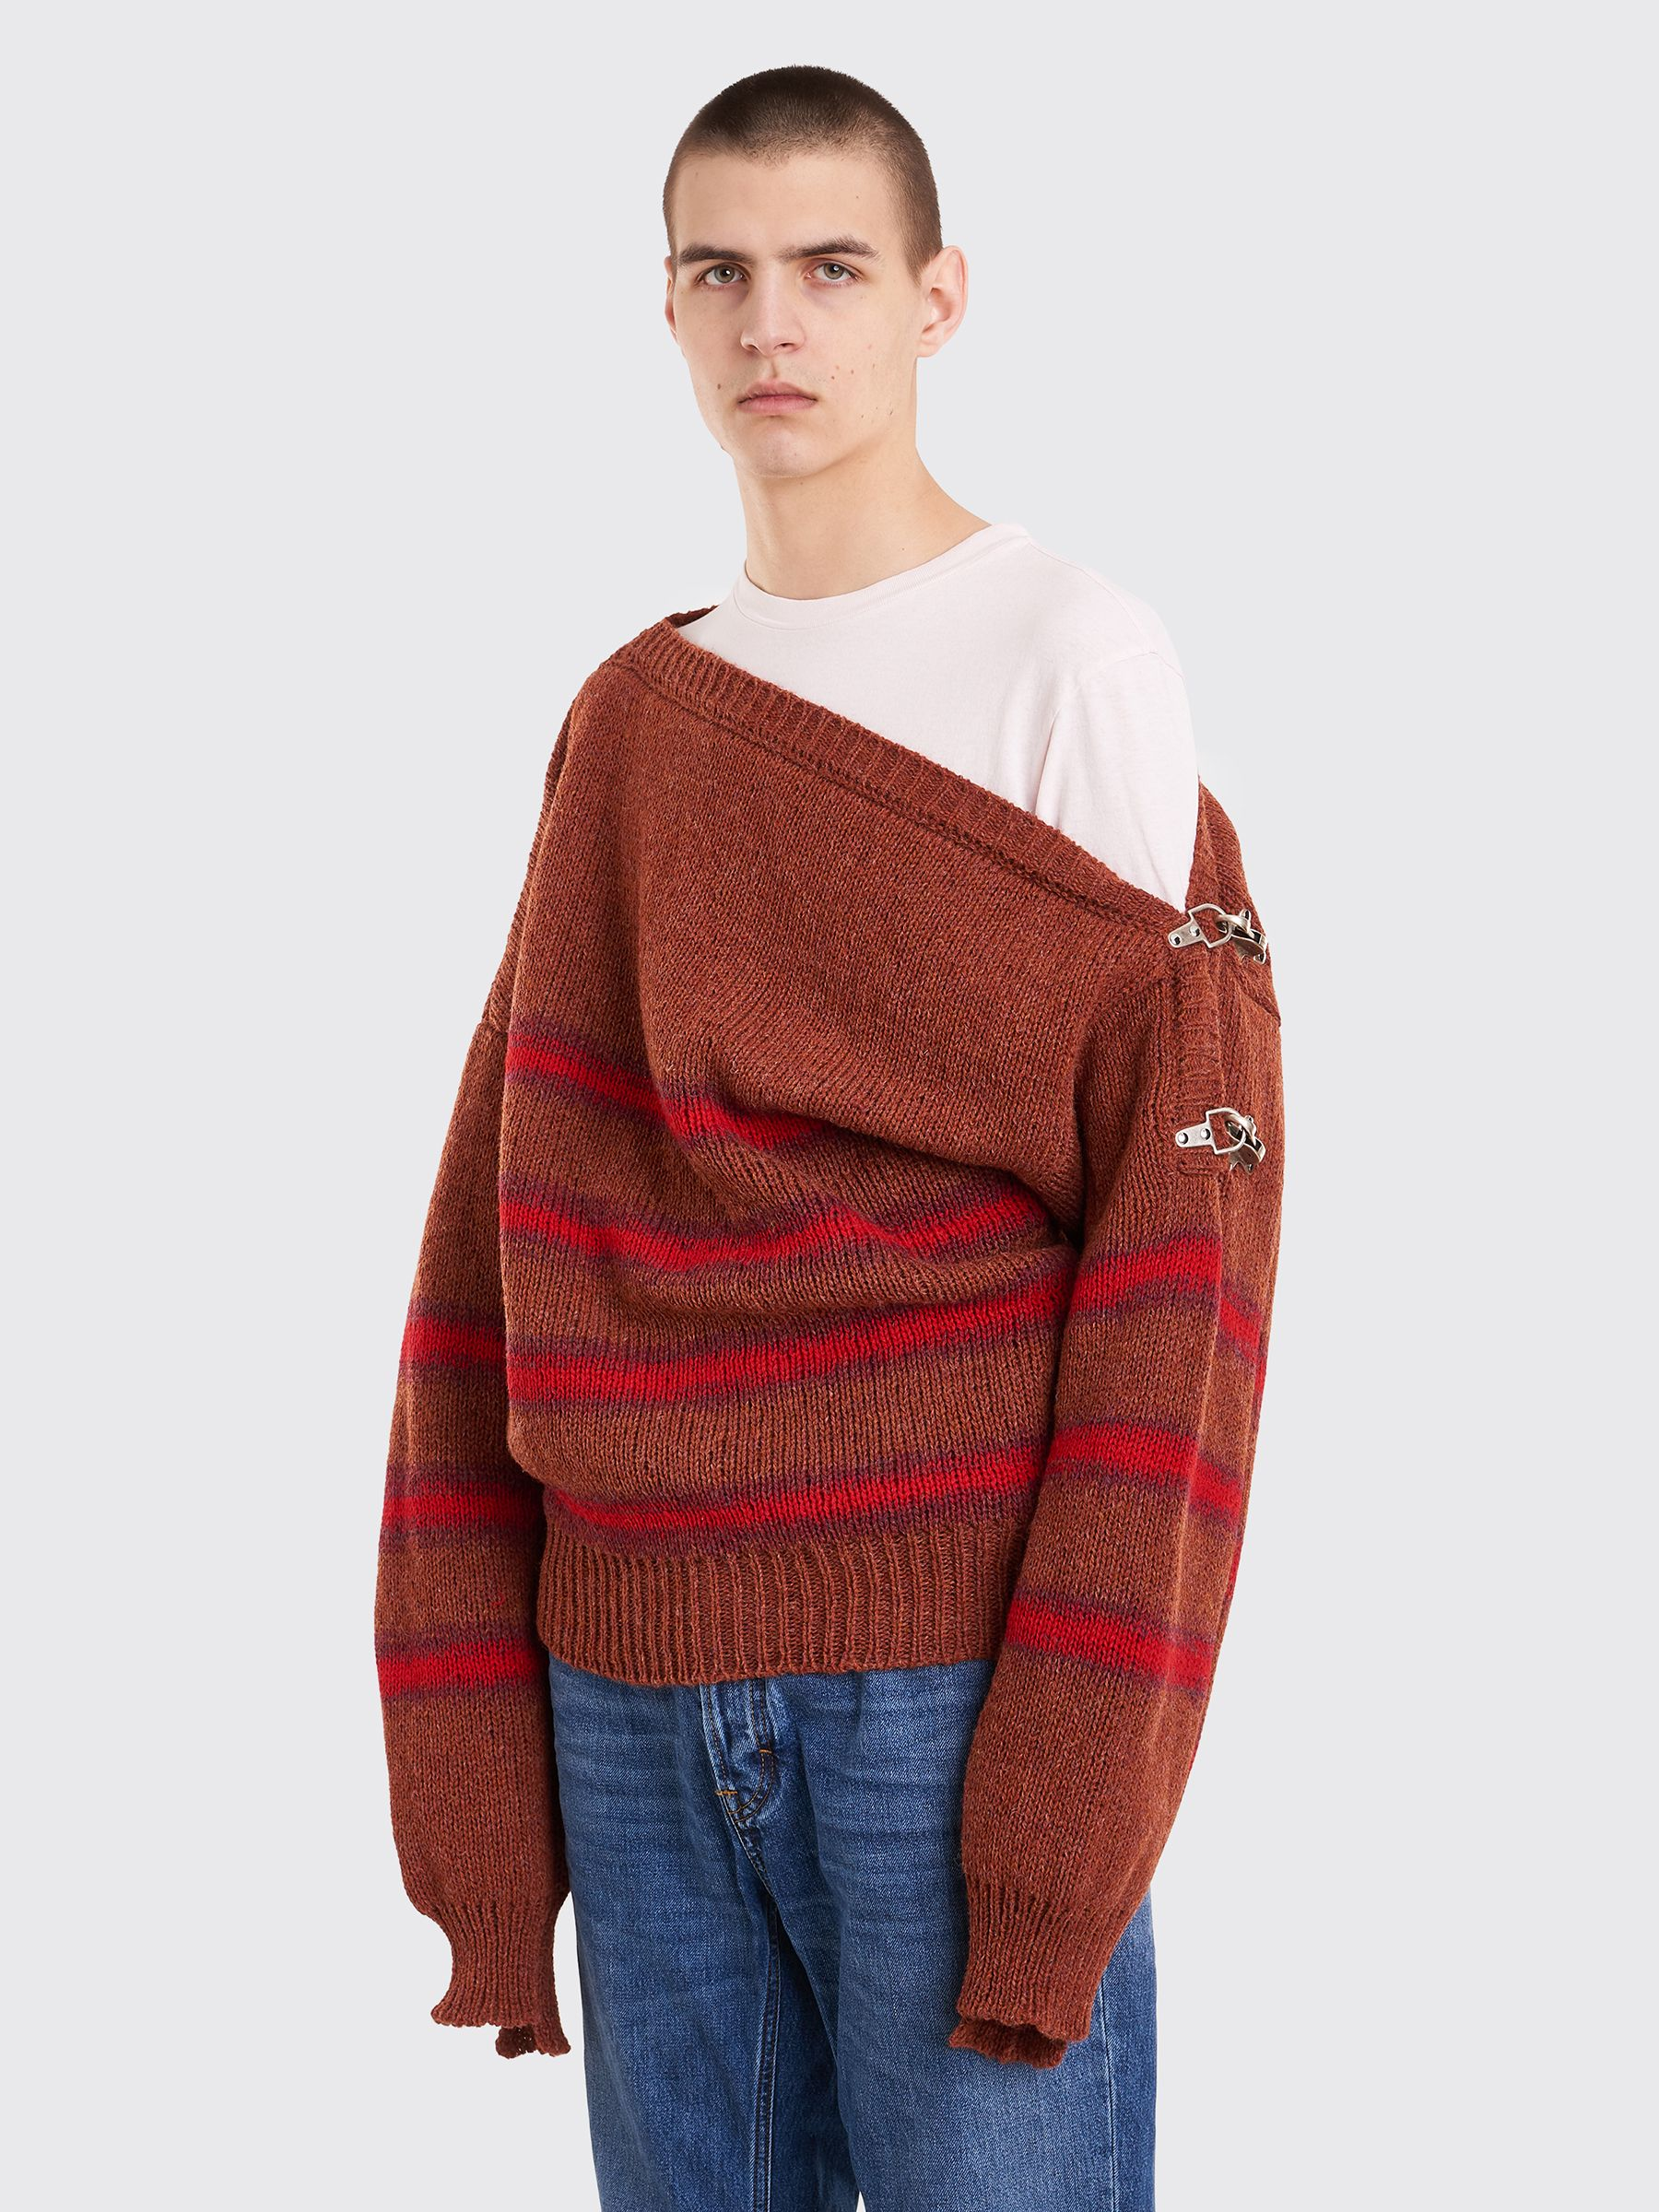 f6bbc05fda823e Raf Simons - Boatneck Sweater With Buckles Terra Wine | TRÈS BIEN ...